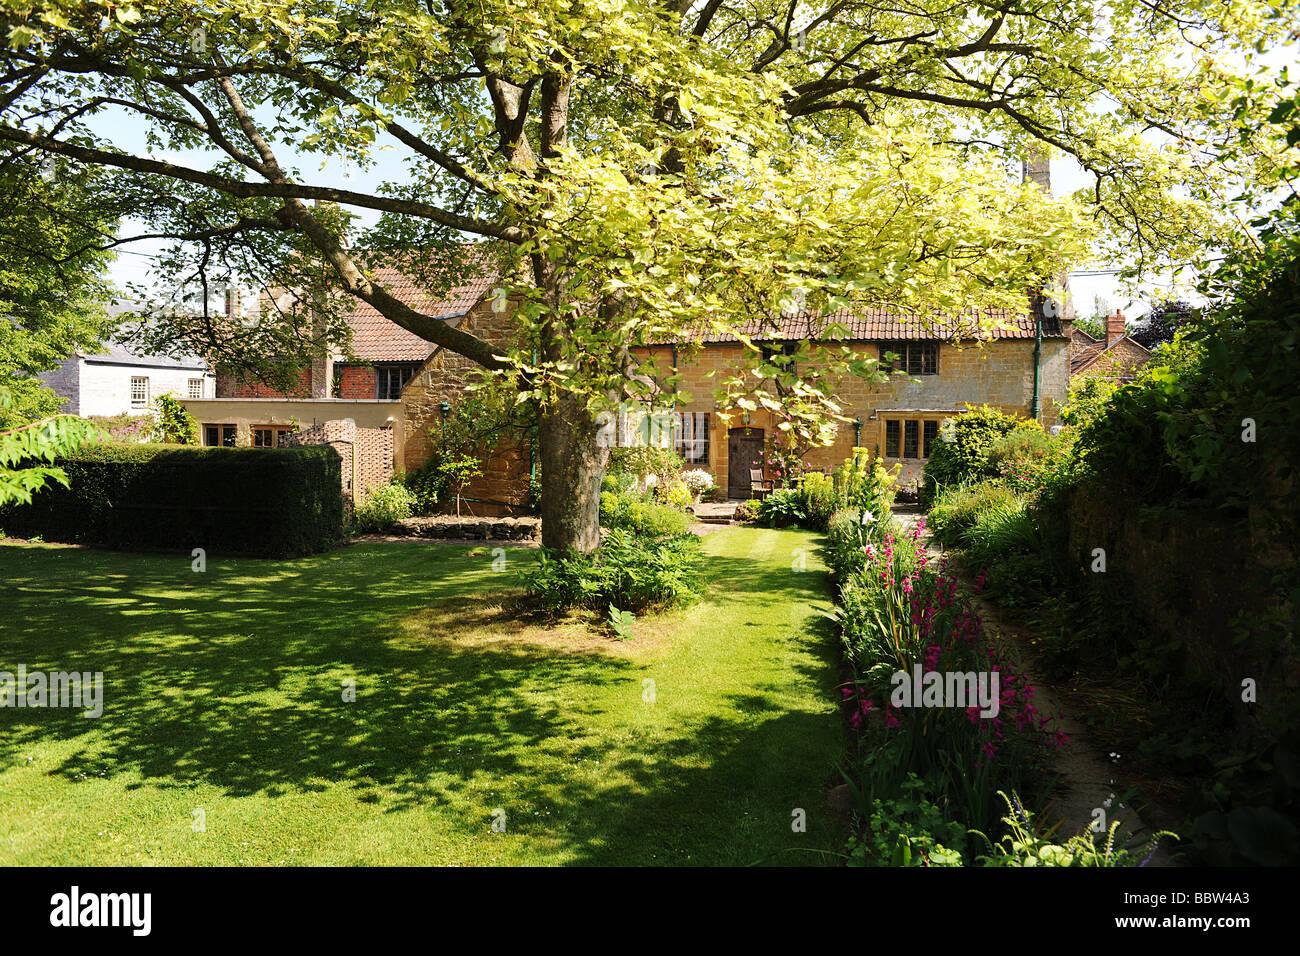 English cottage at East Lambrook Manor Gardens, South Petherton, Somerset - Stock Image